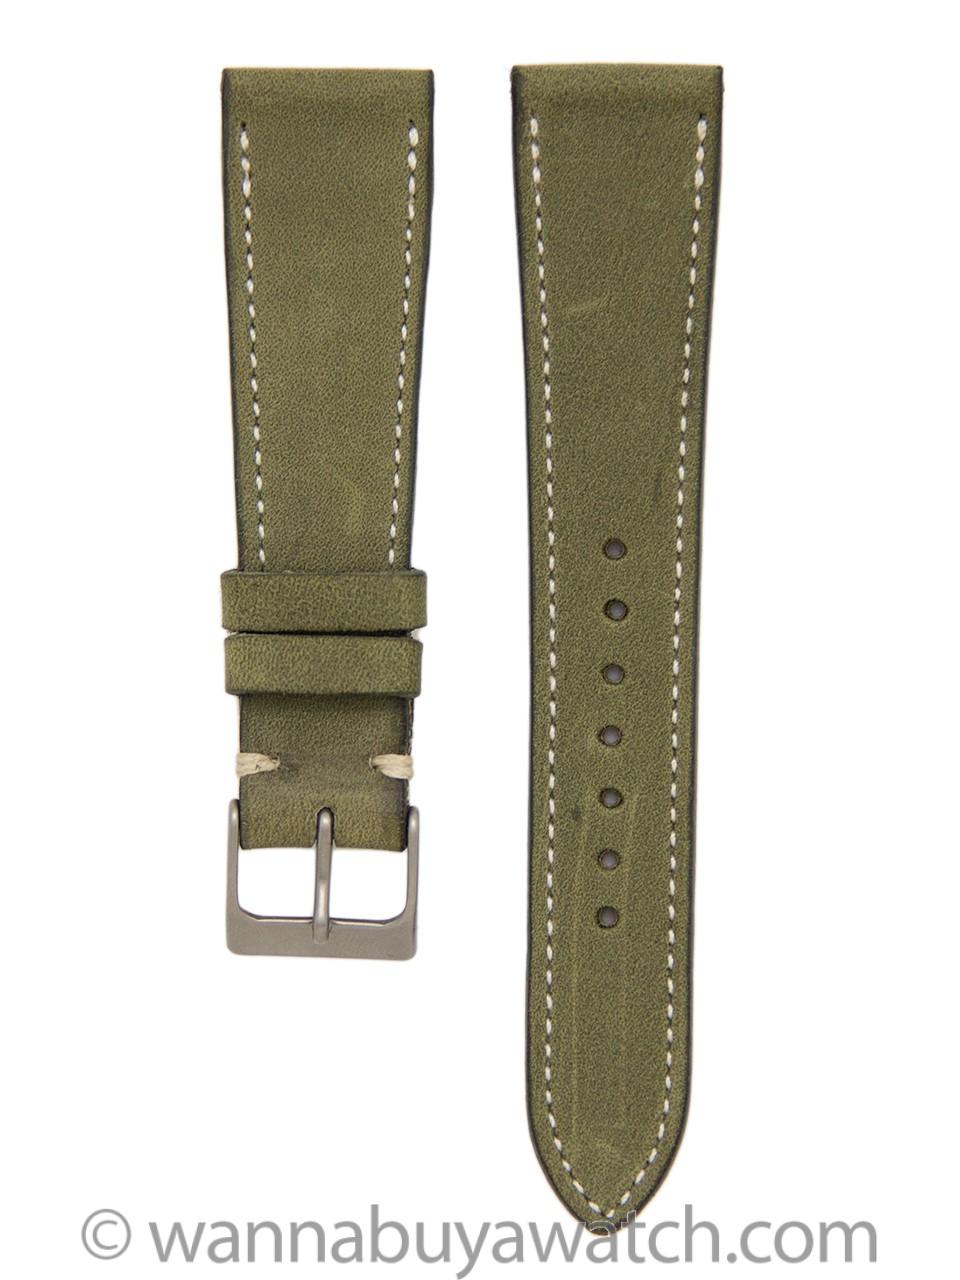 Leather Strap Nubuck Finely Side Stitched 20mm